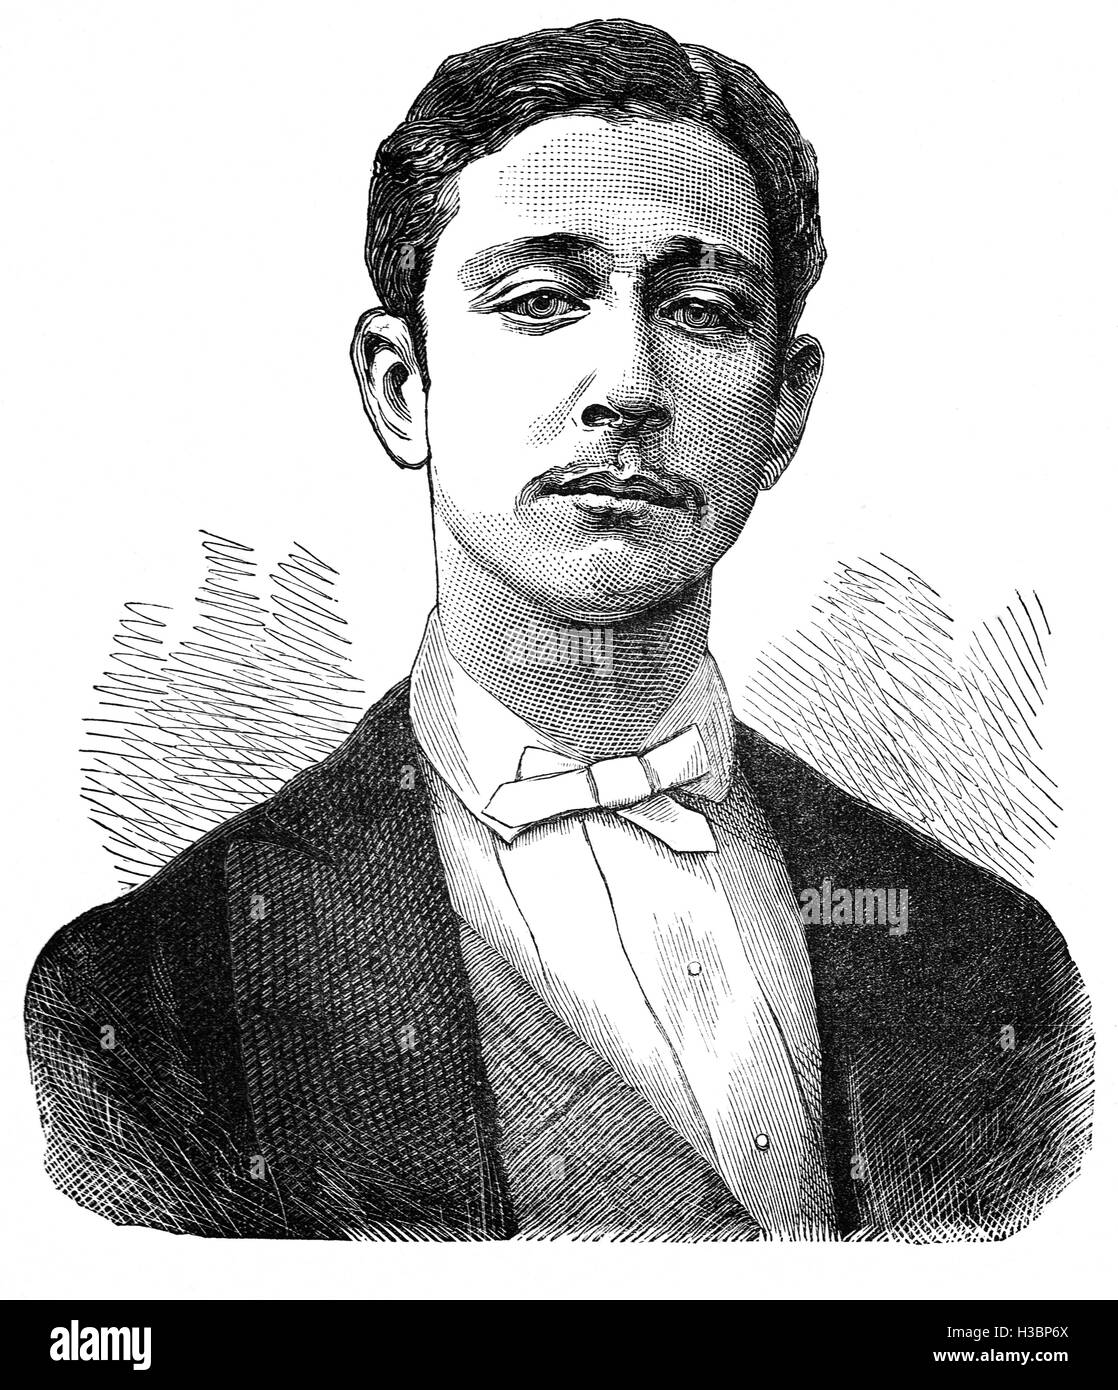 Napoléon, Prince Imperial (full name: Napoléon Eugène Louis